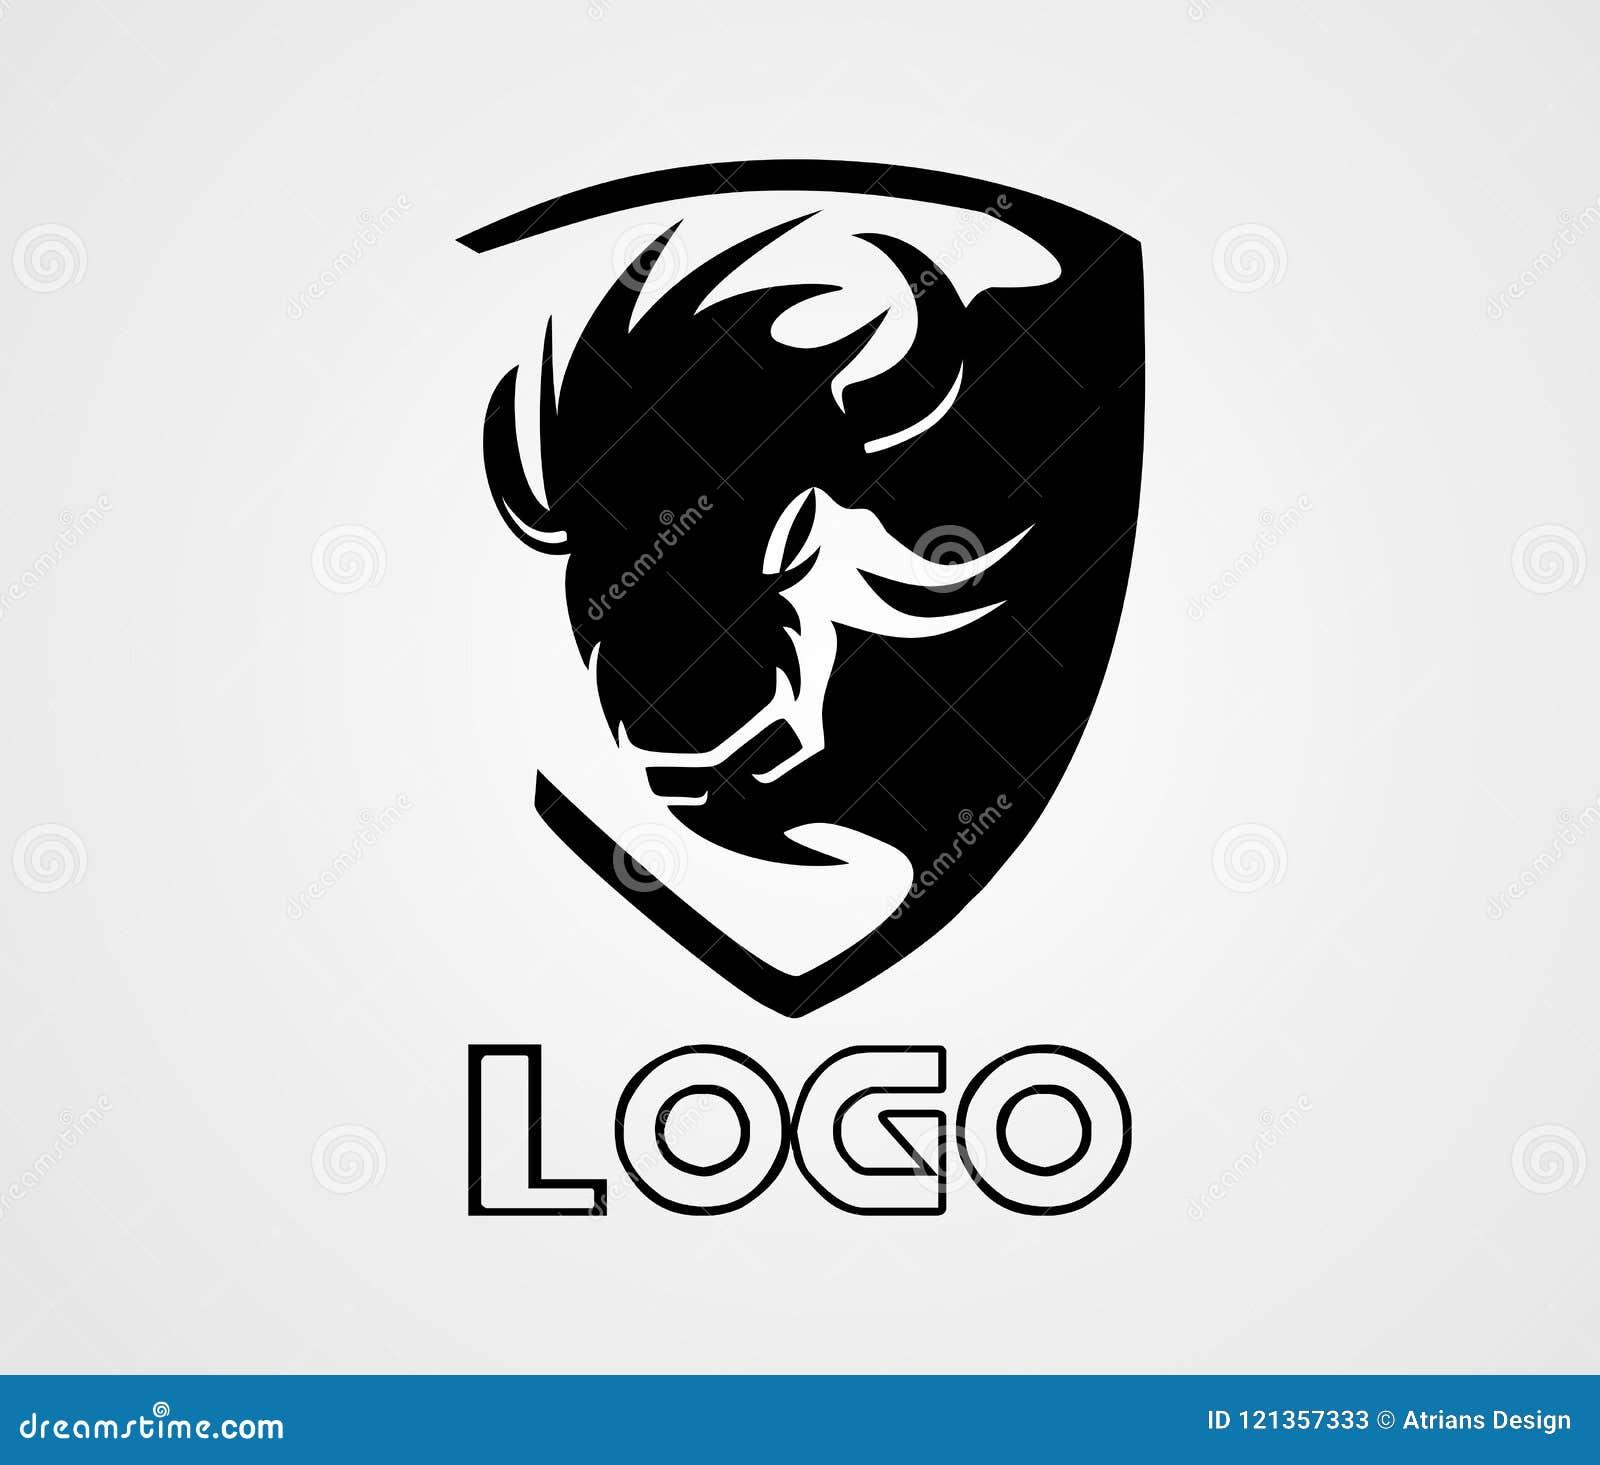 Bison Logo Vector, logo animal